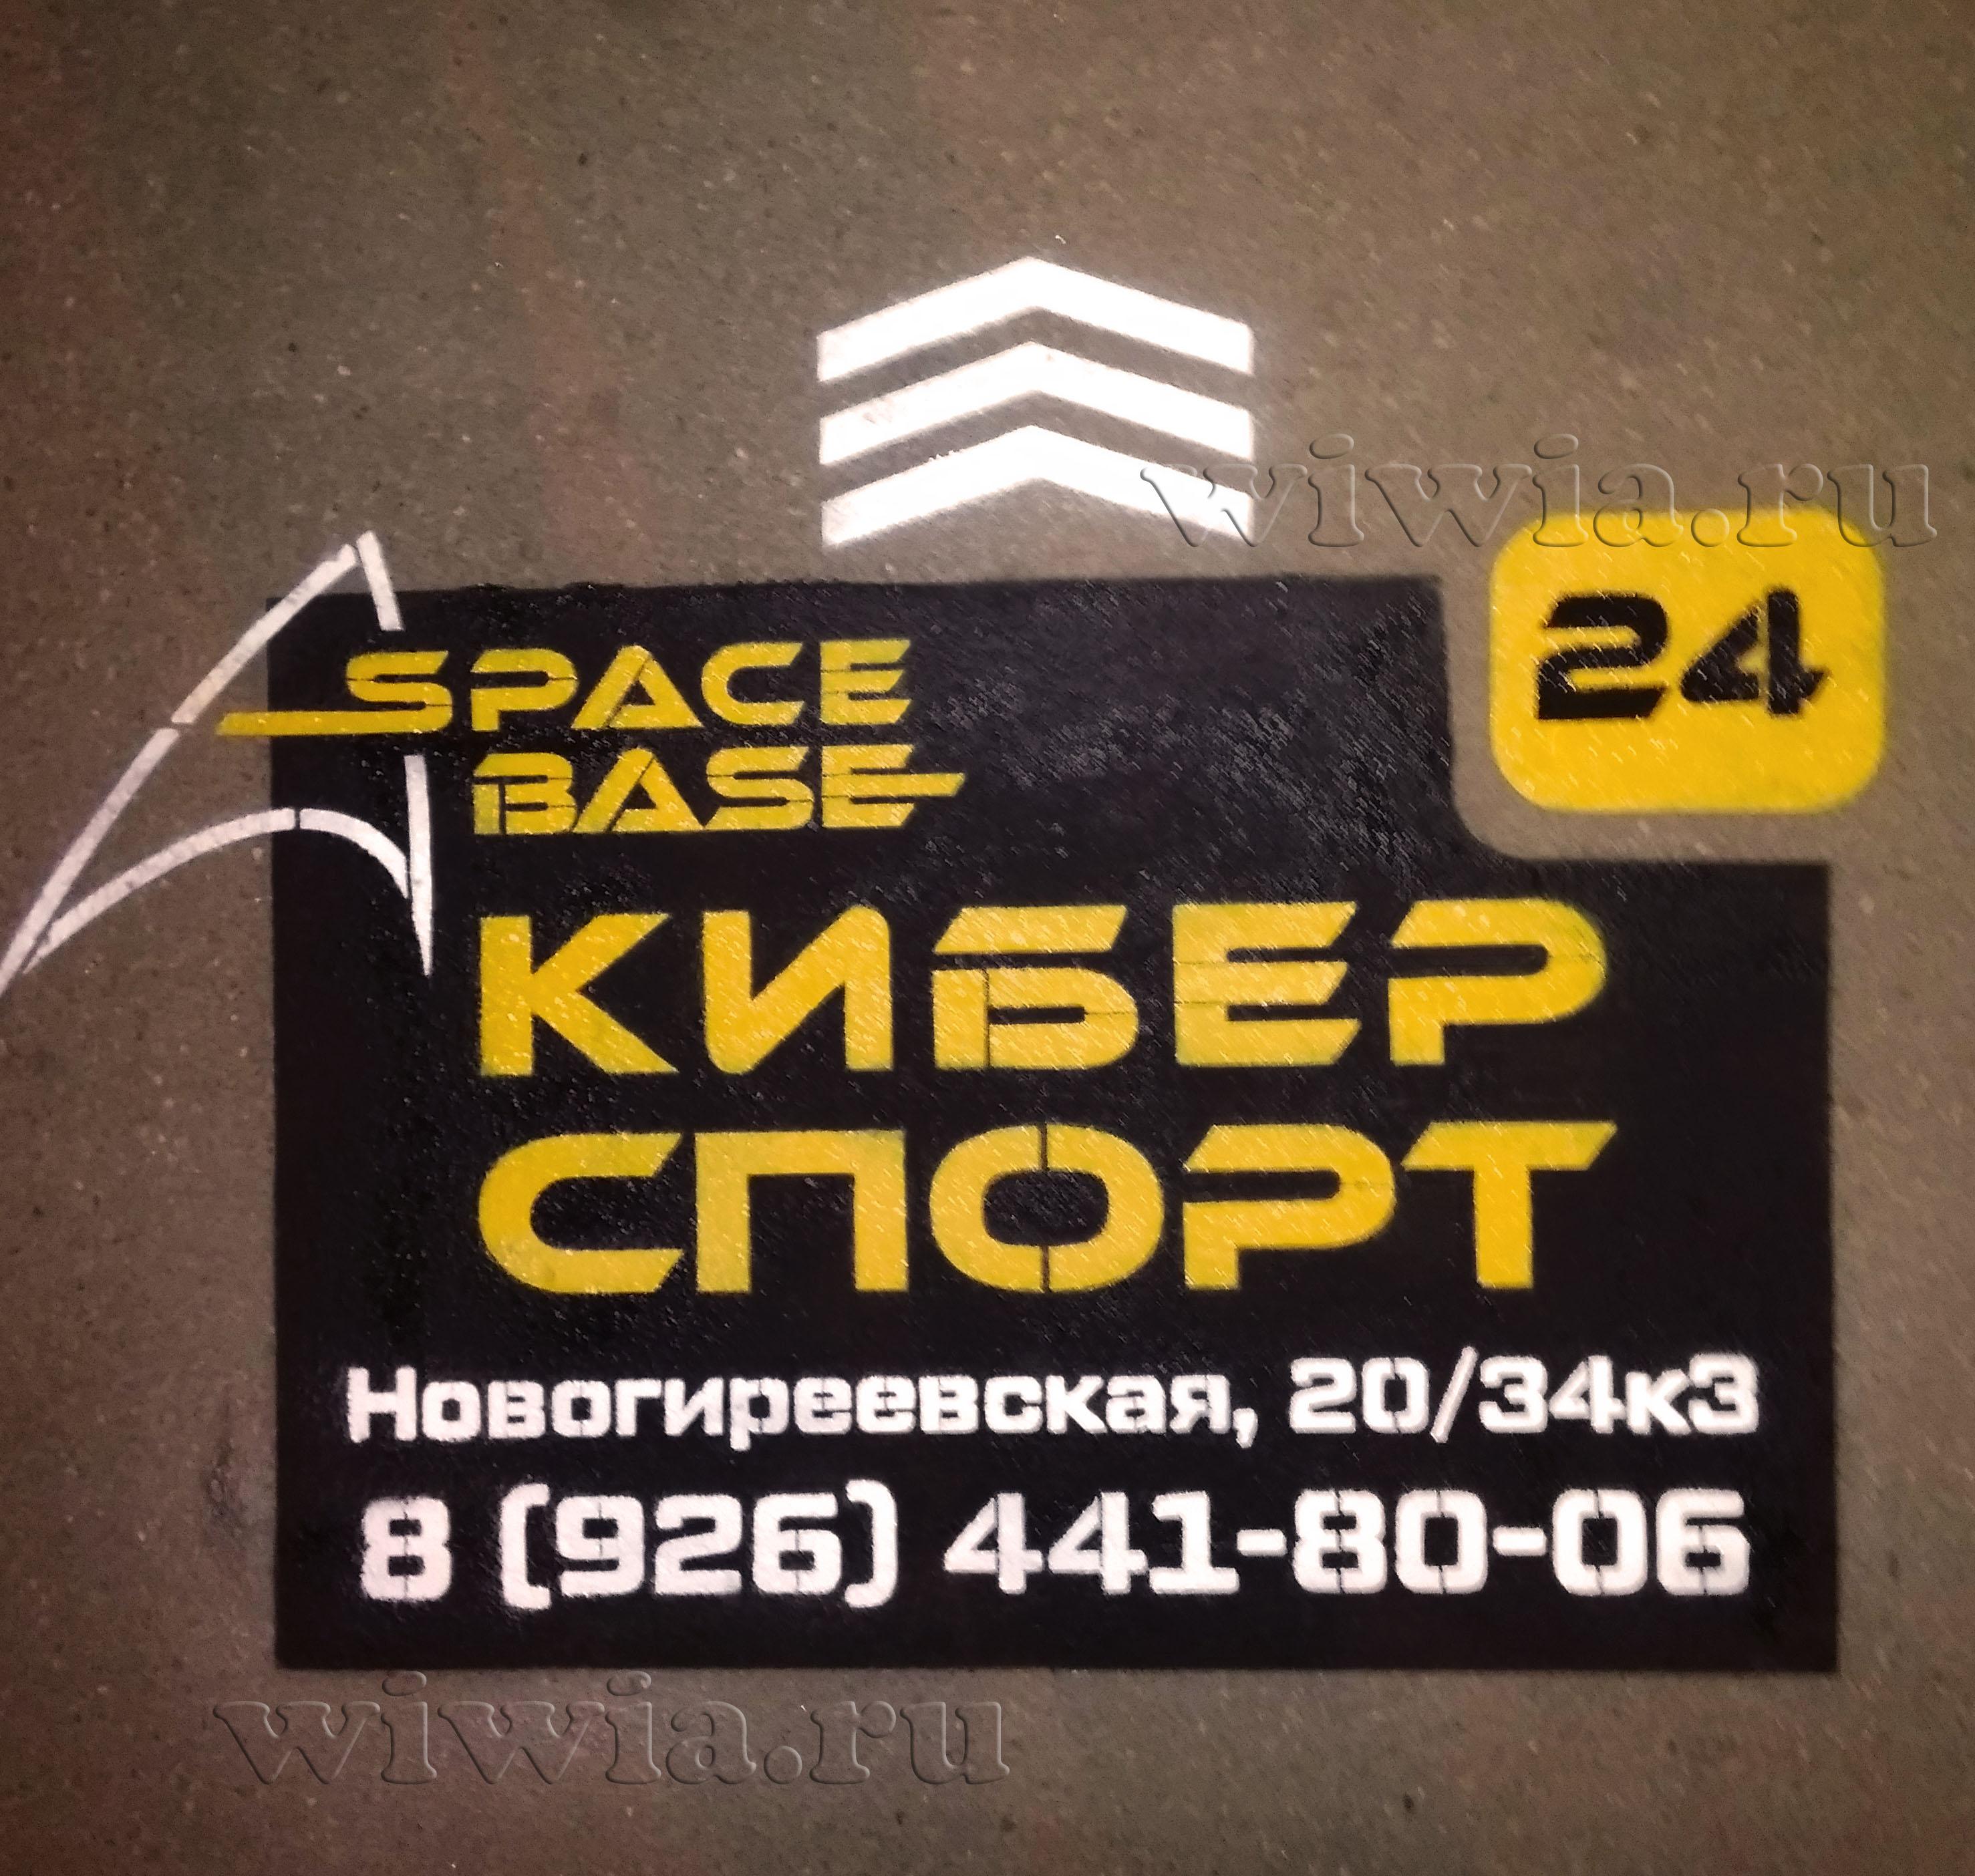 Реклама на асфальте Кибер Спорт